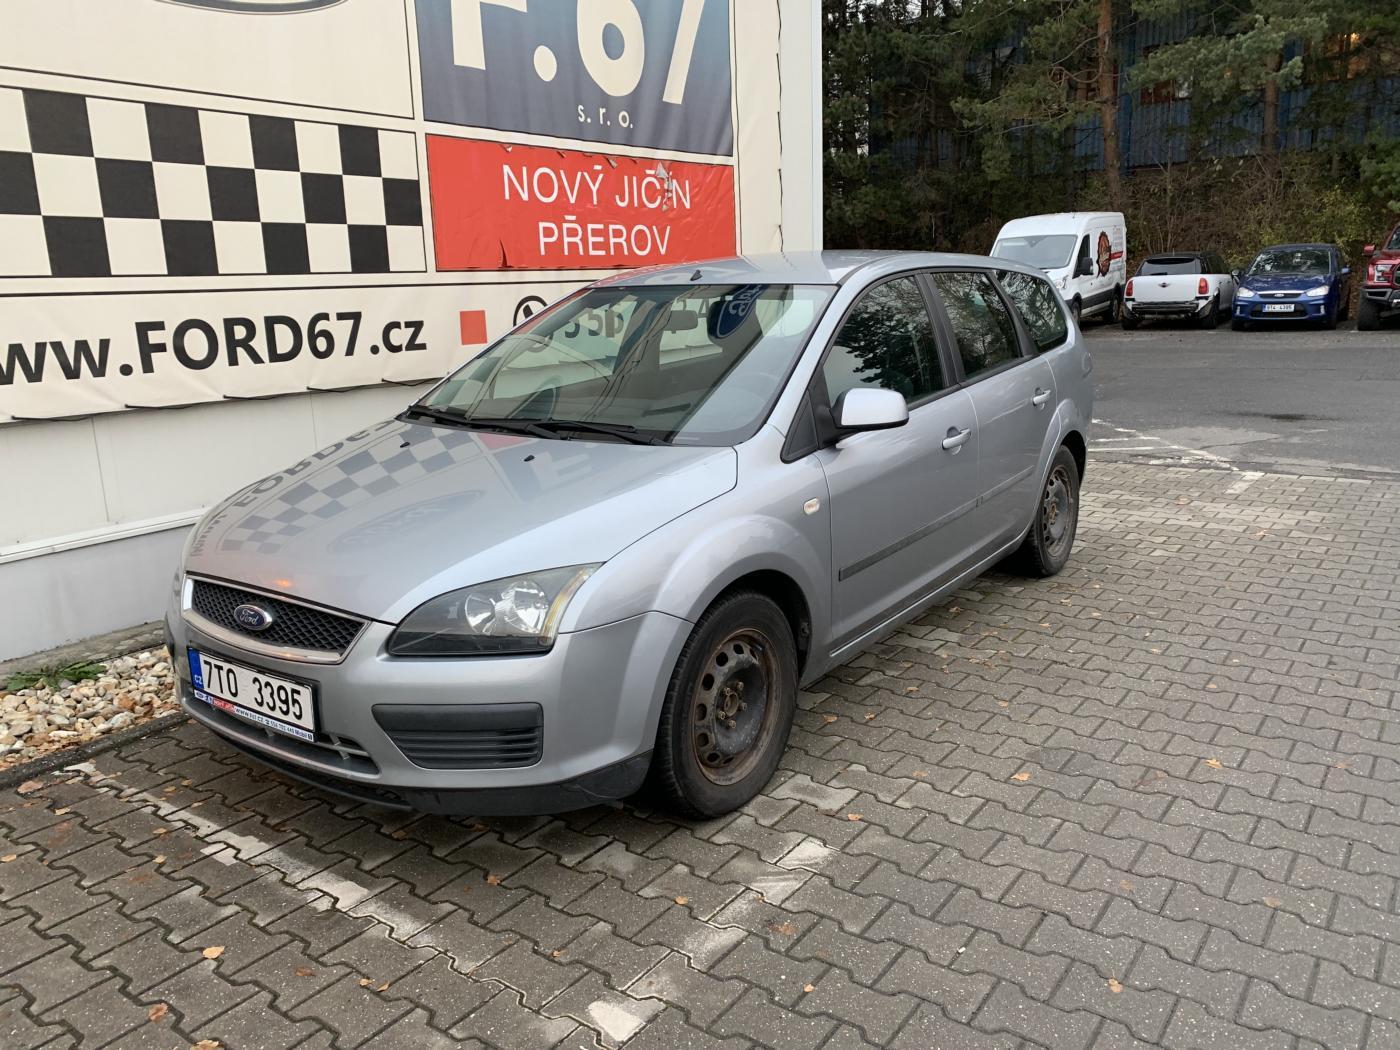 Ford Focus 1,6TDCi od FORD67.cz kombi